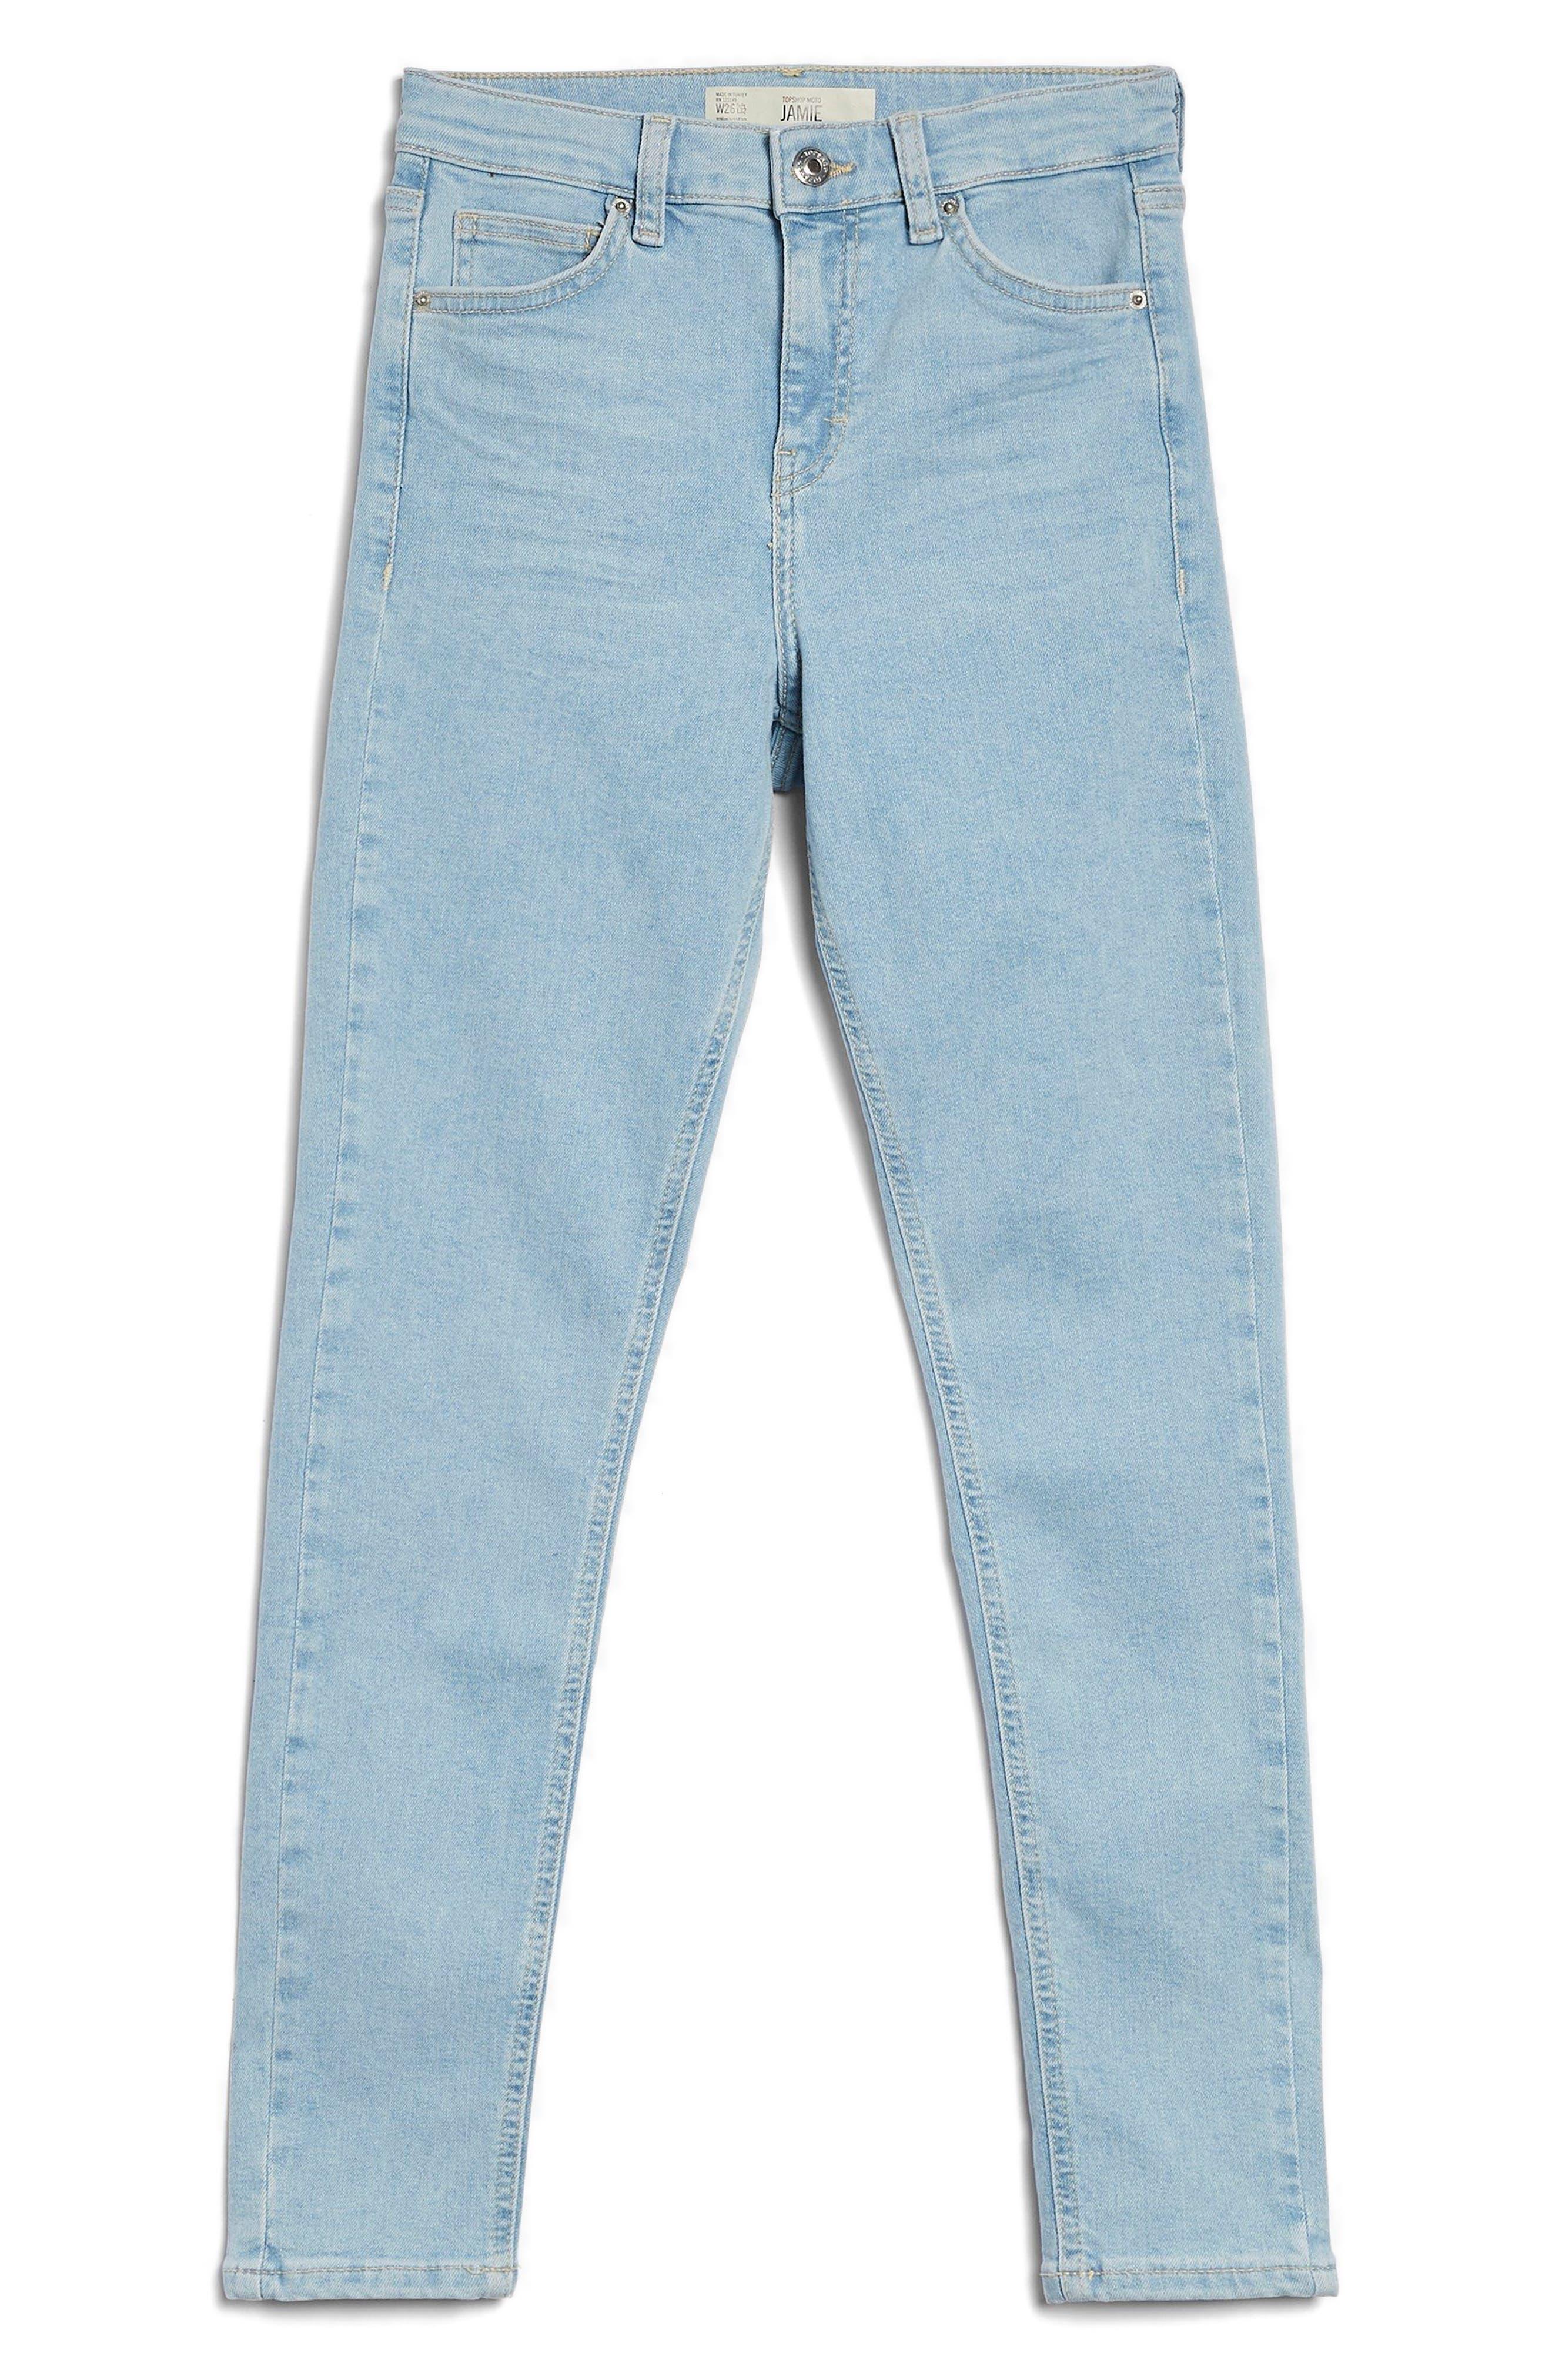 Moto Jamie Jeans,                             Alternate thumbnail 4, color,                             Light Denim